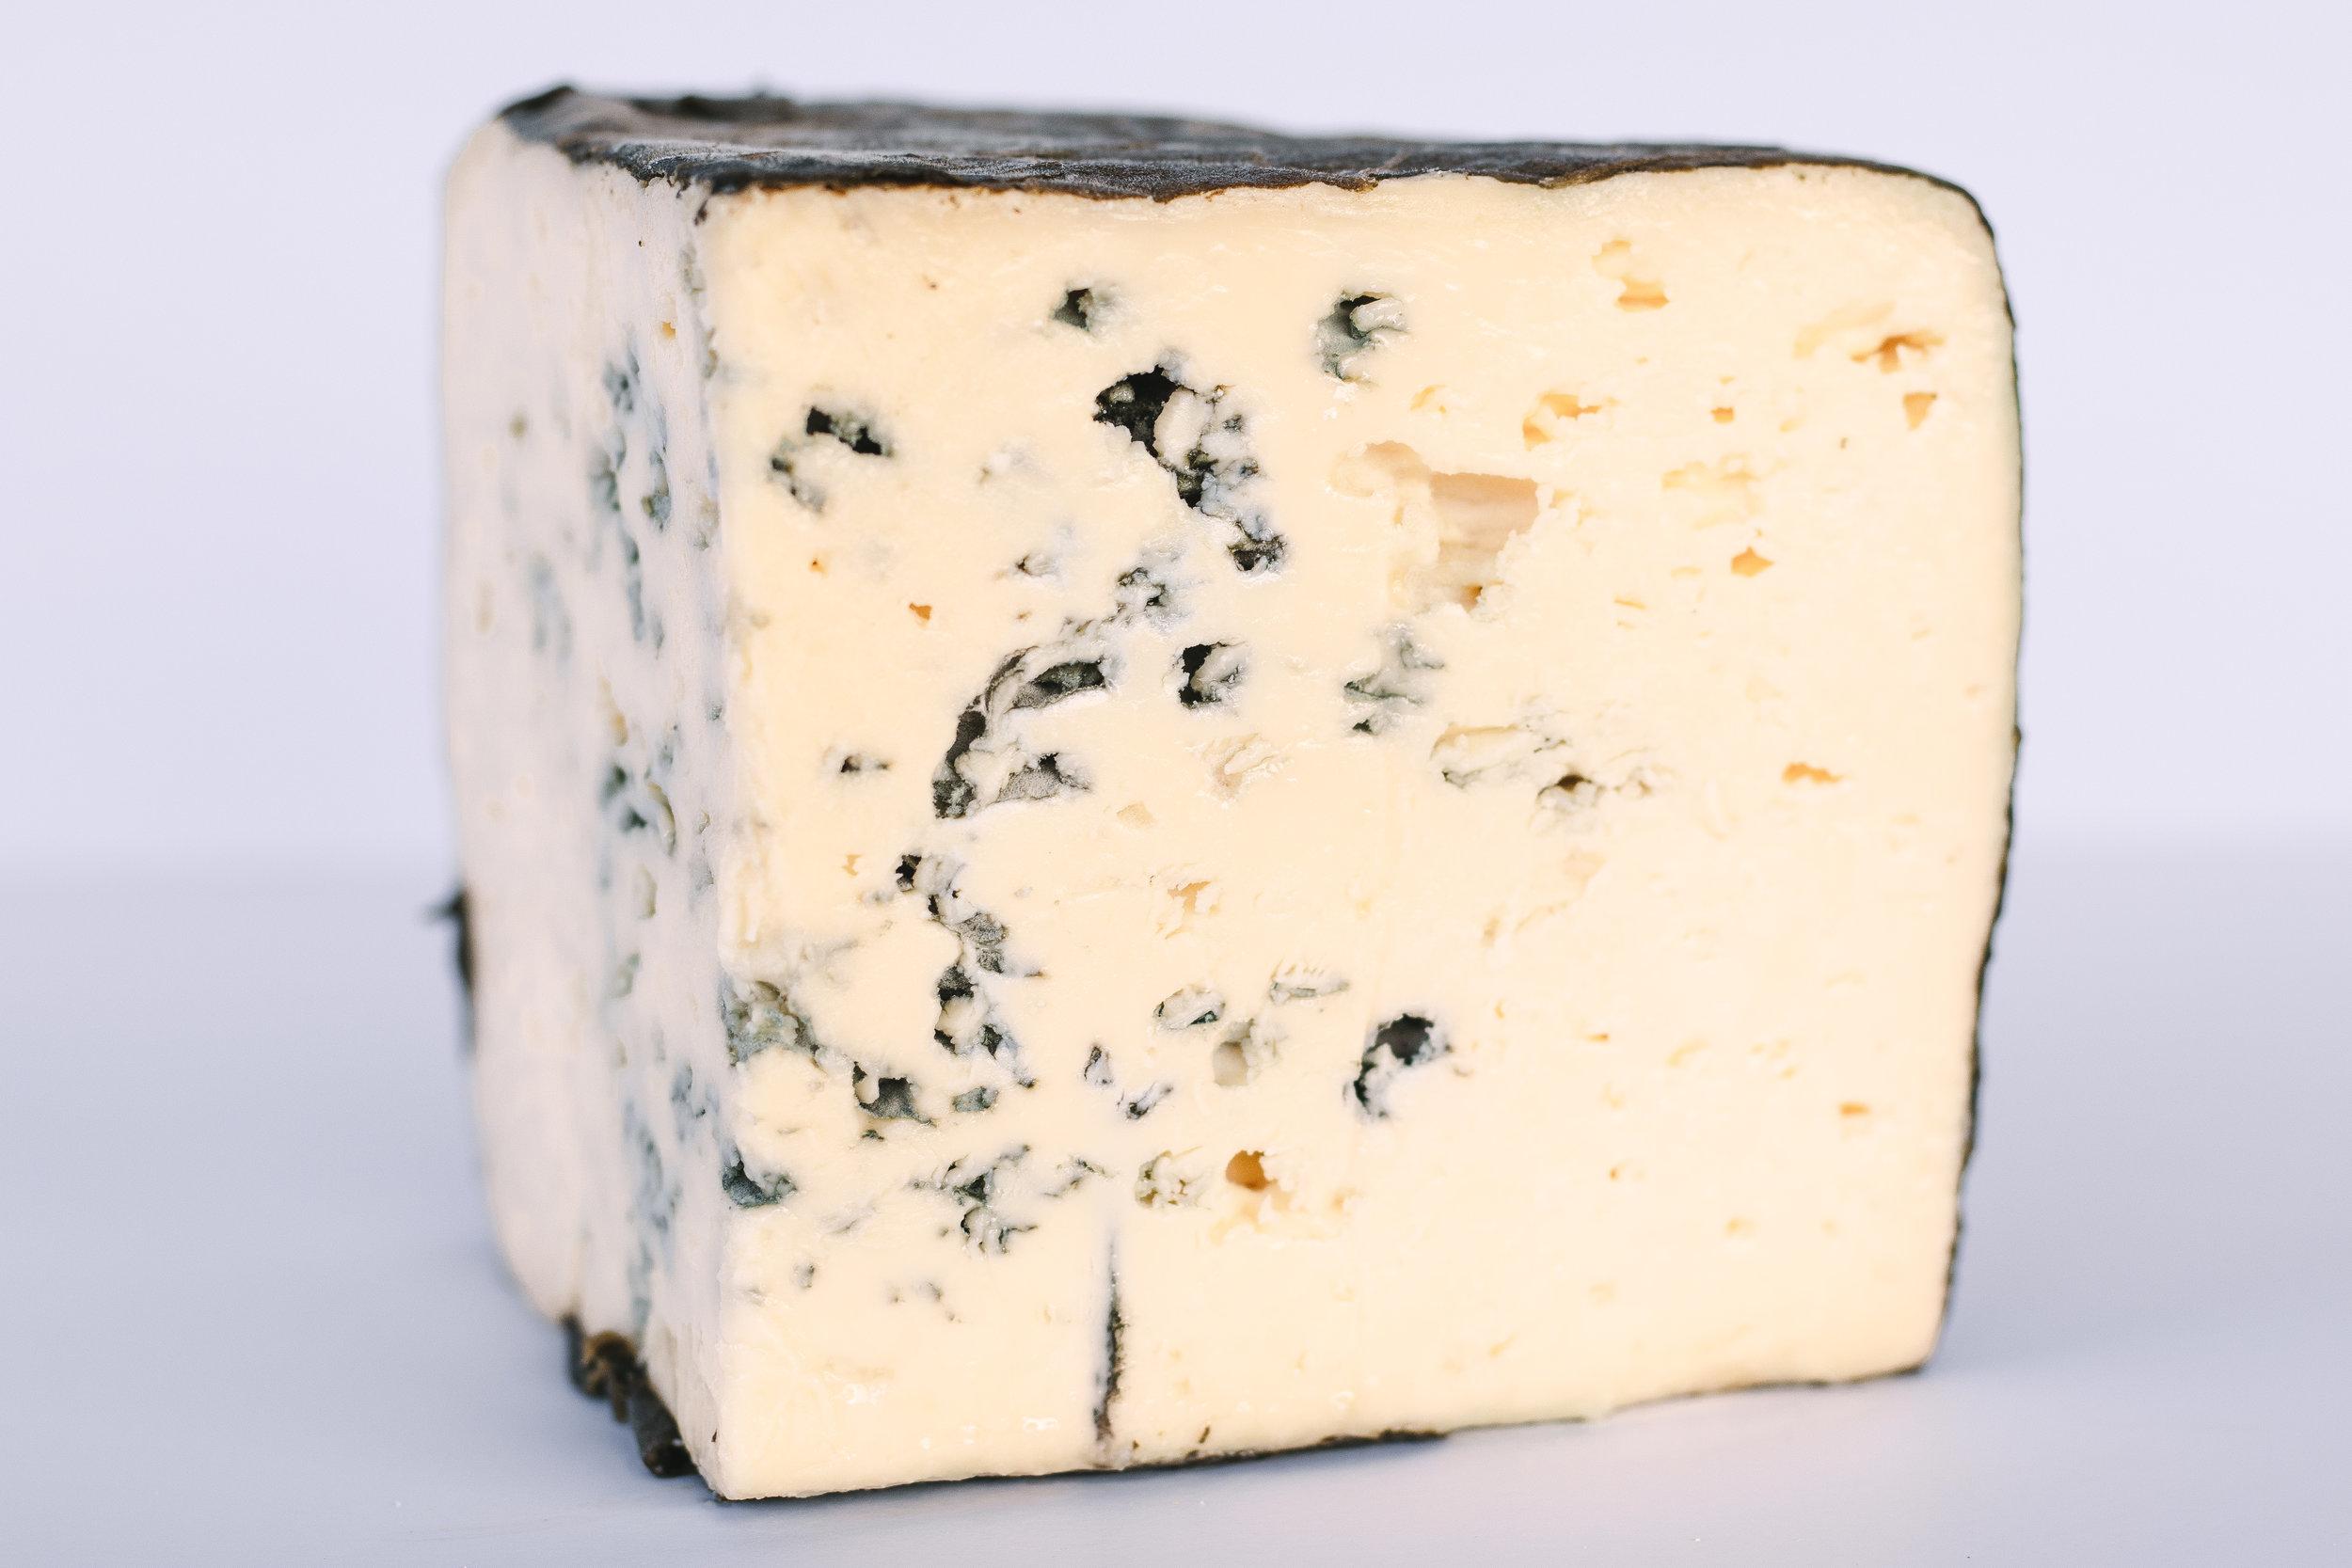 Shakerag Blue - Raw Milk/Aged 4 months (more info)